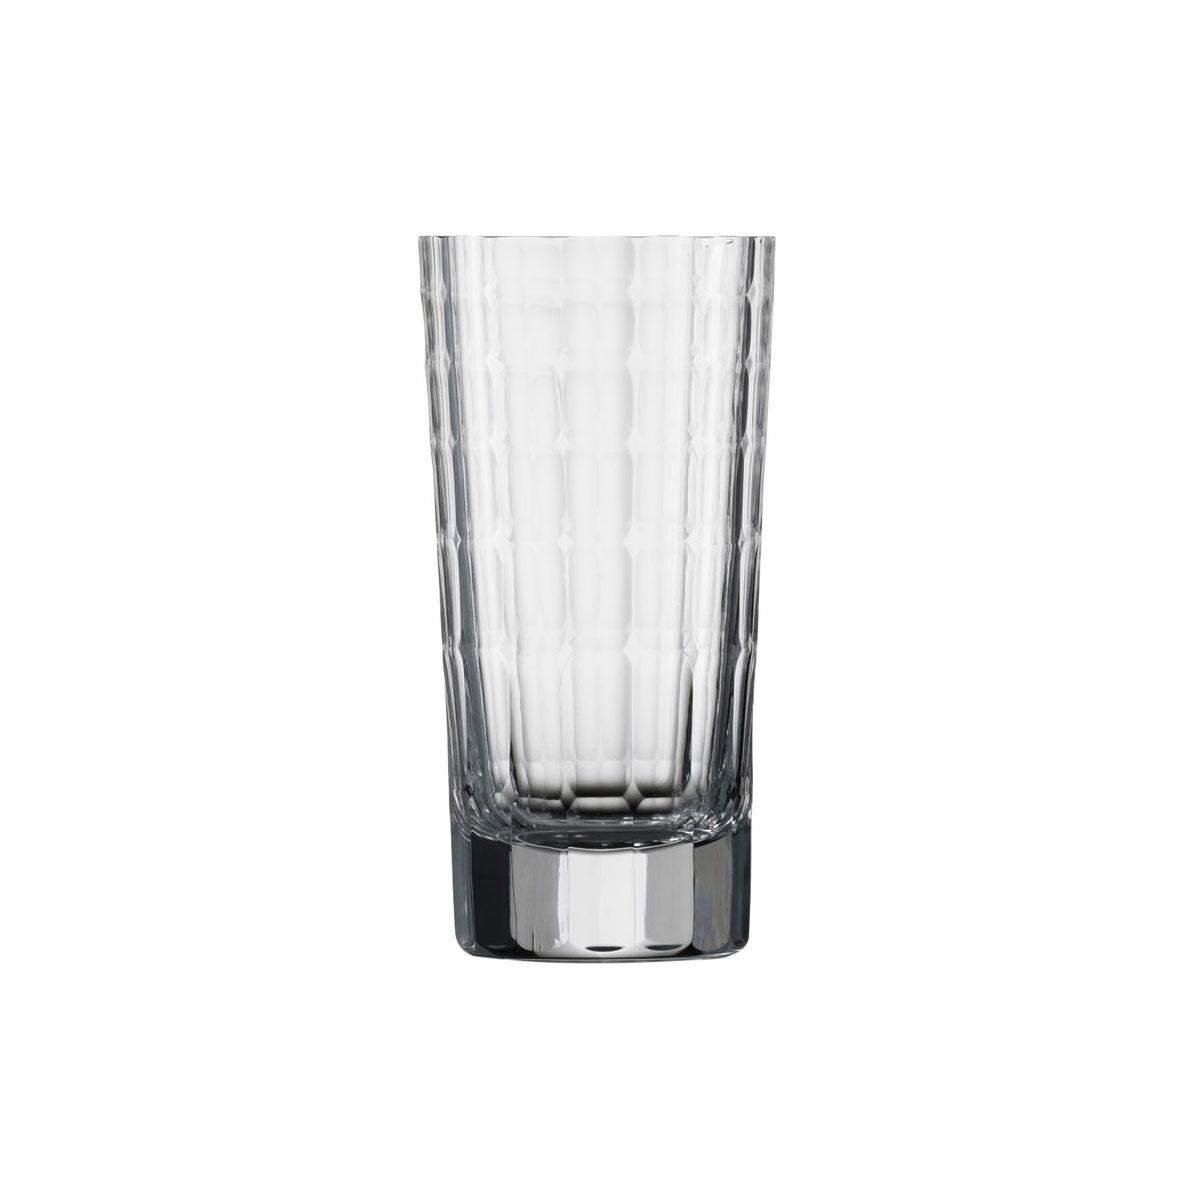 Schott Zwiesel Tritan Crystal, 1872 Charles Schumann Hommage Carat Longdrink Small, Single